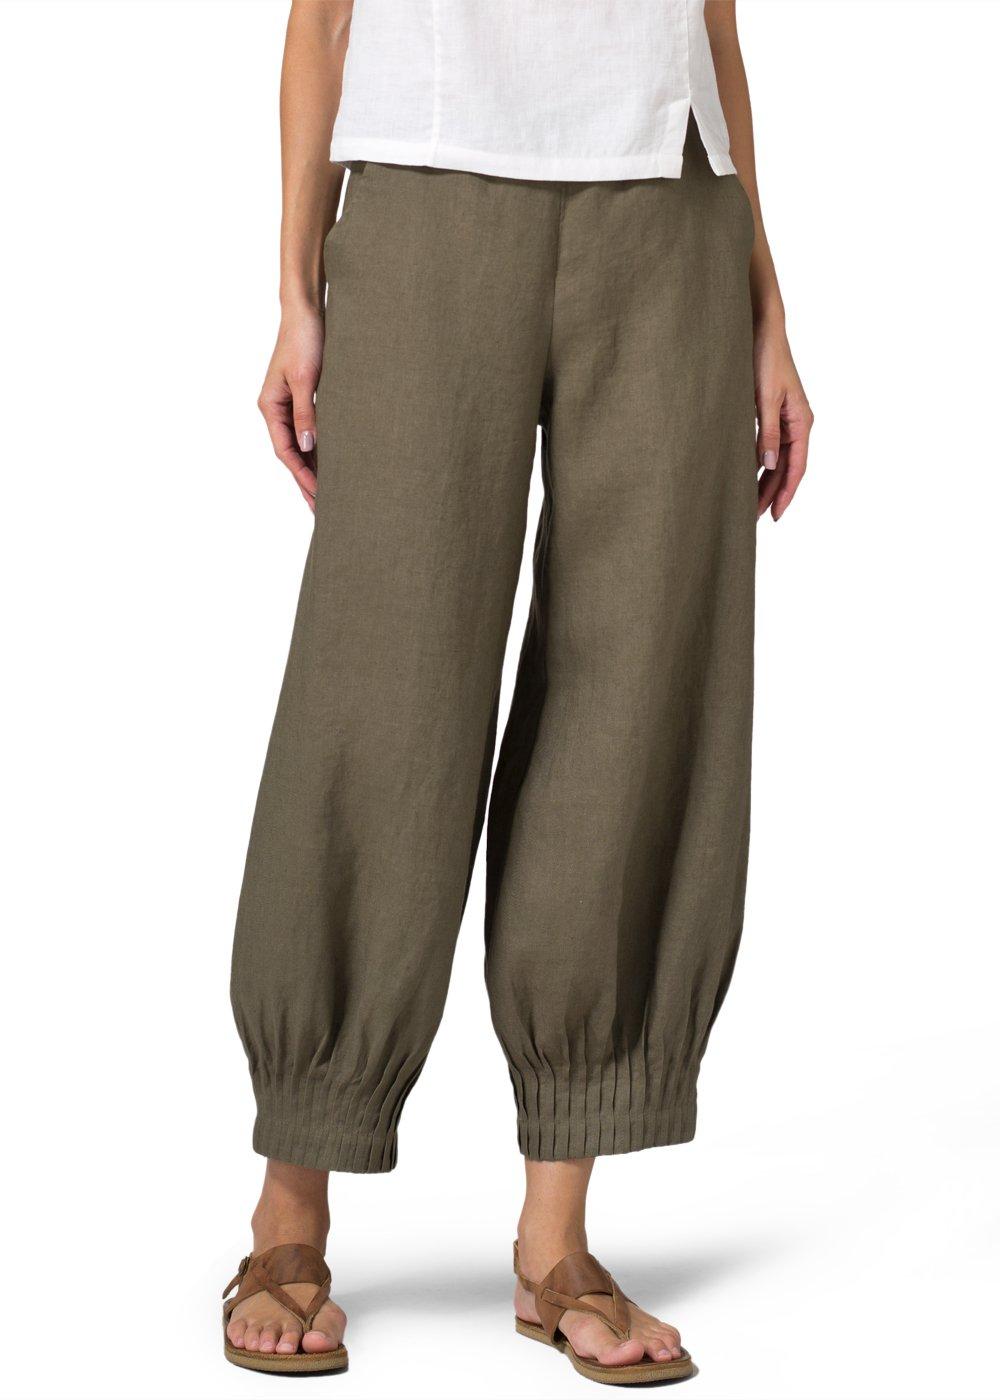 Vivid Linen Pleated Cuff Crop Pants-XL-Khaki Green